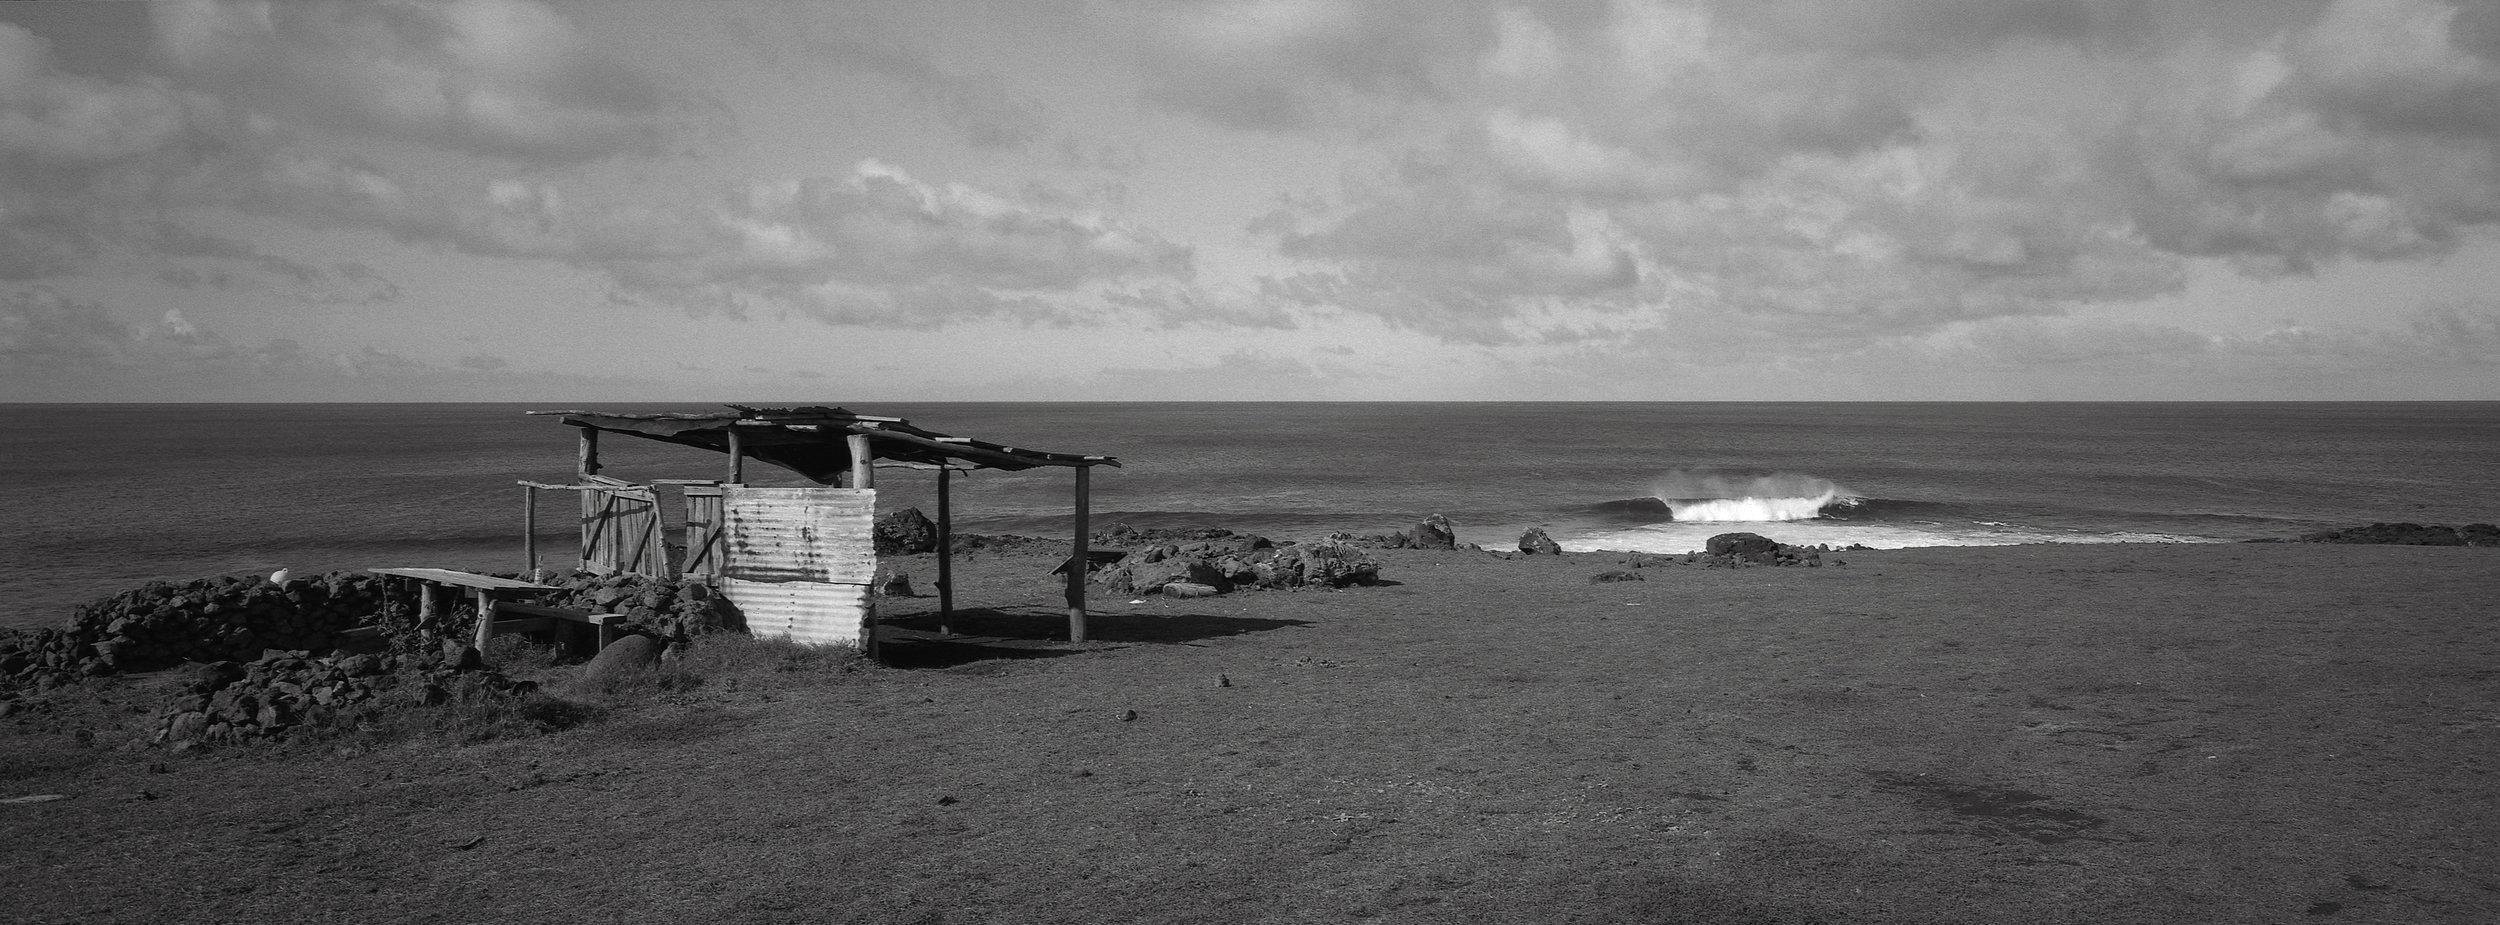 Shelter, Easter Island